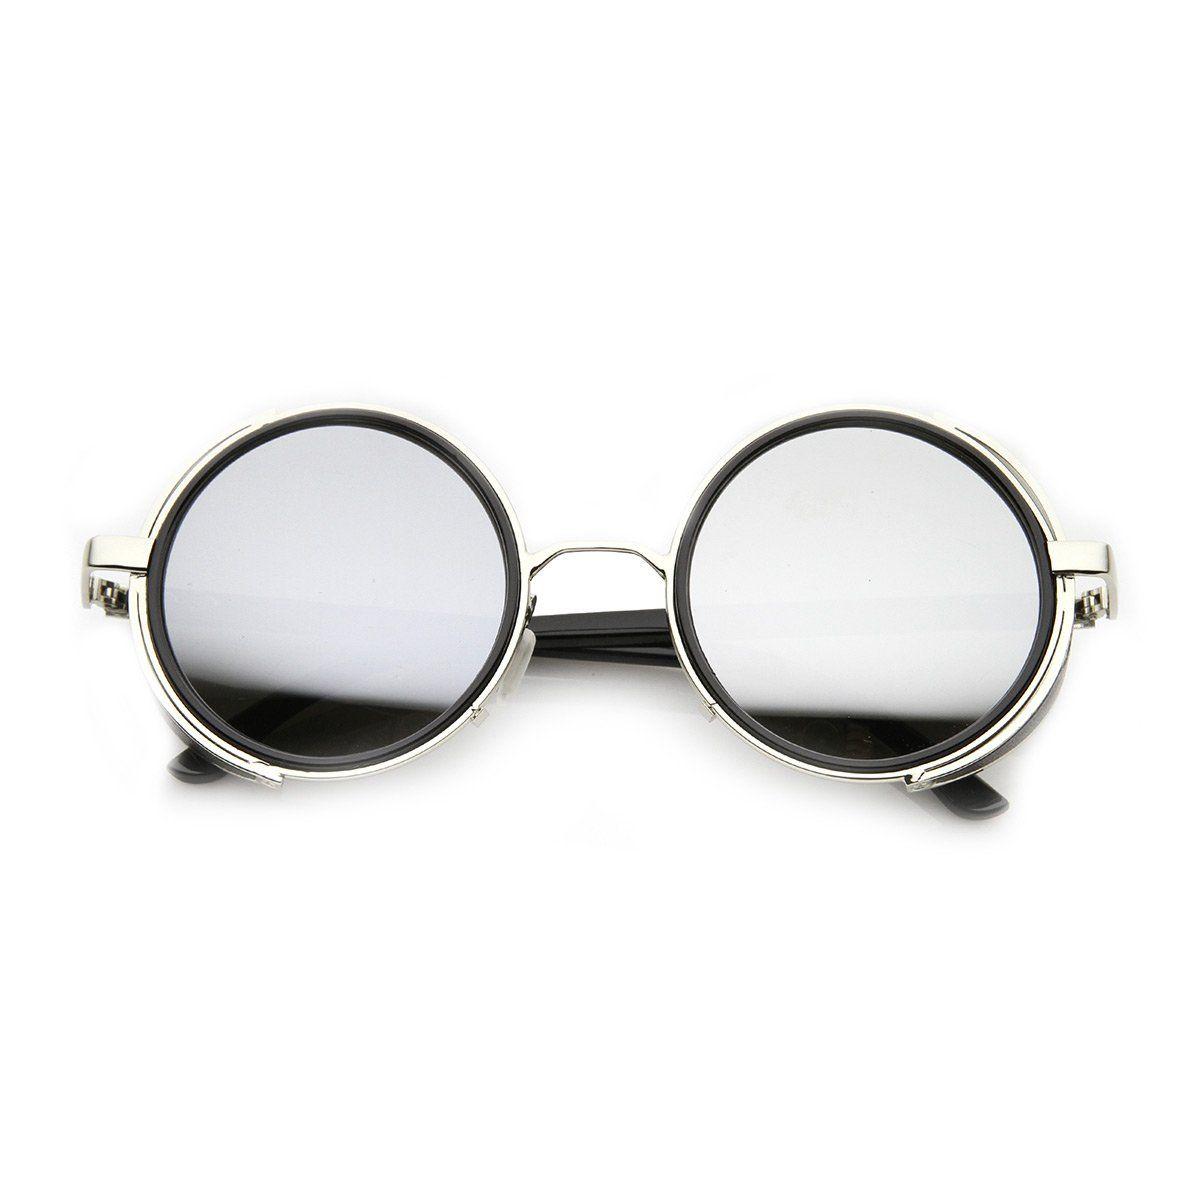 0c8c1431c6 Studio Cover Metal Frame Side Shield Round Sunglasses in 2019 ...